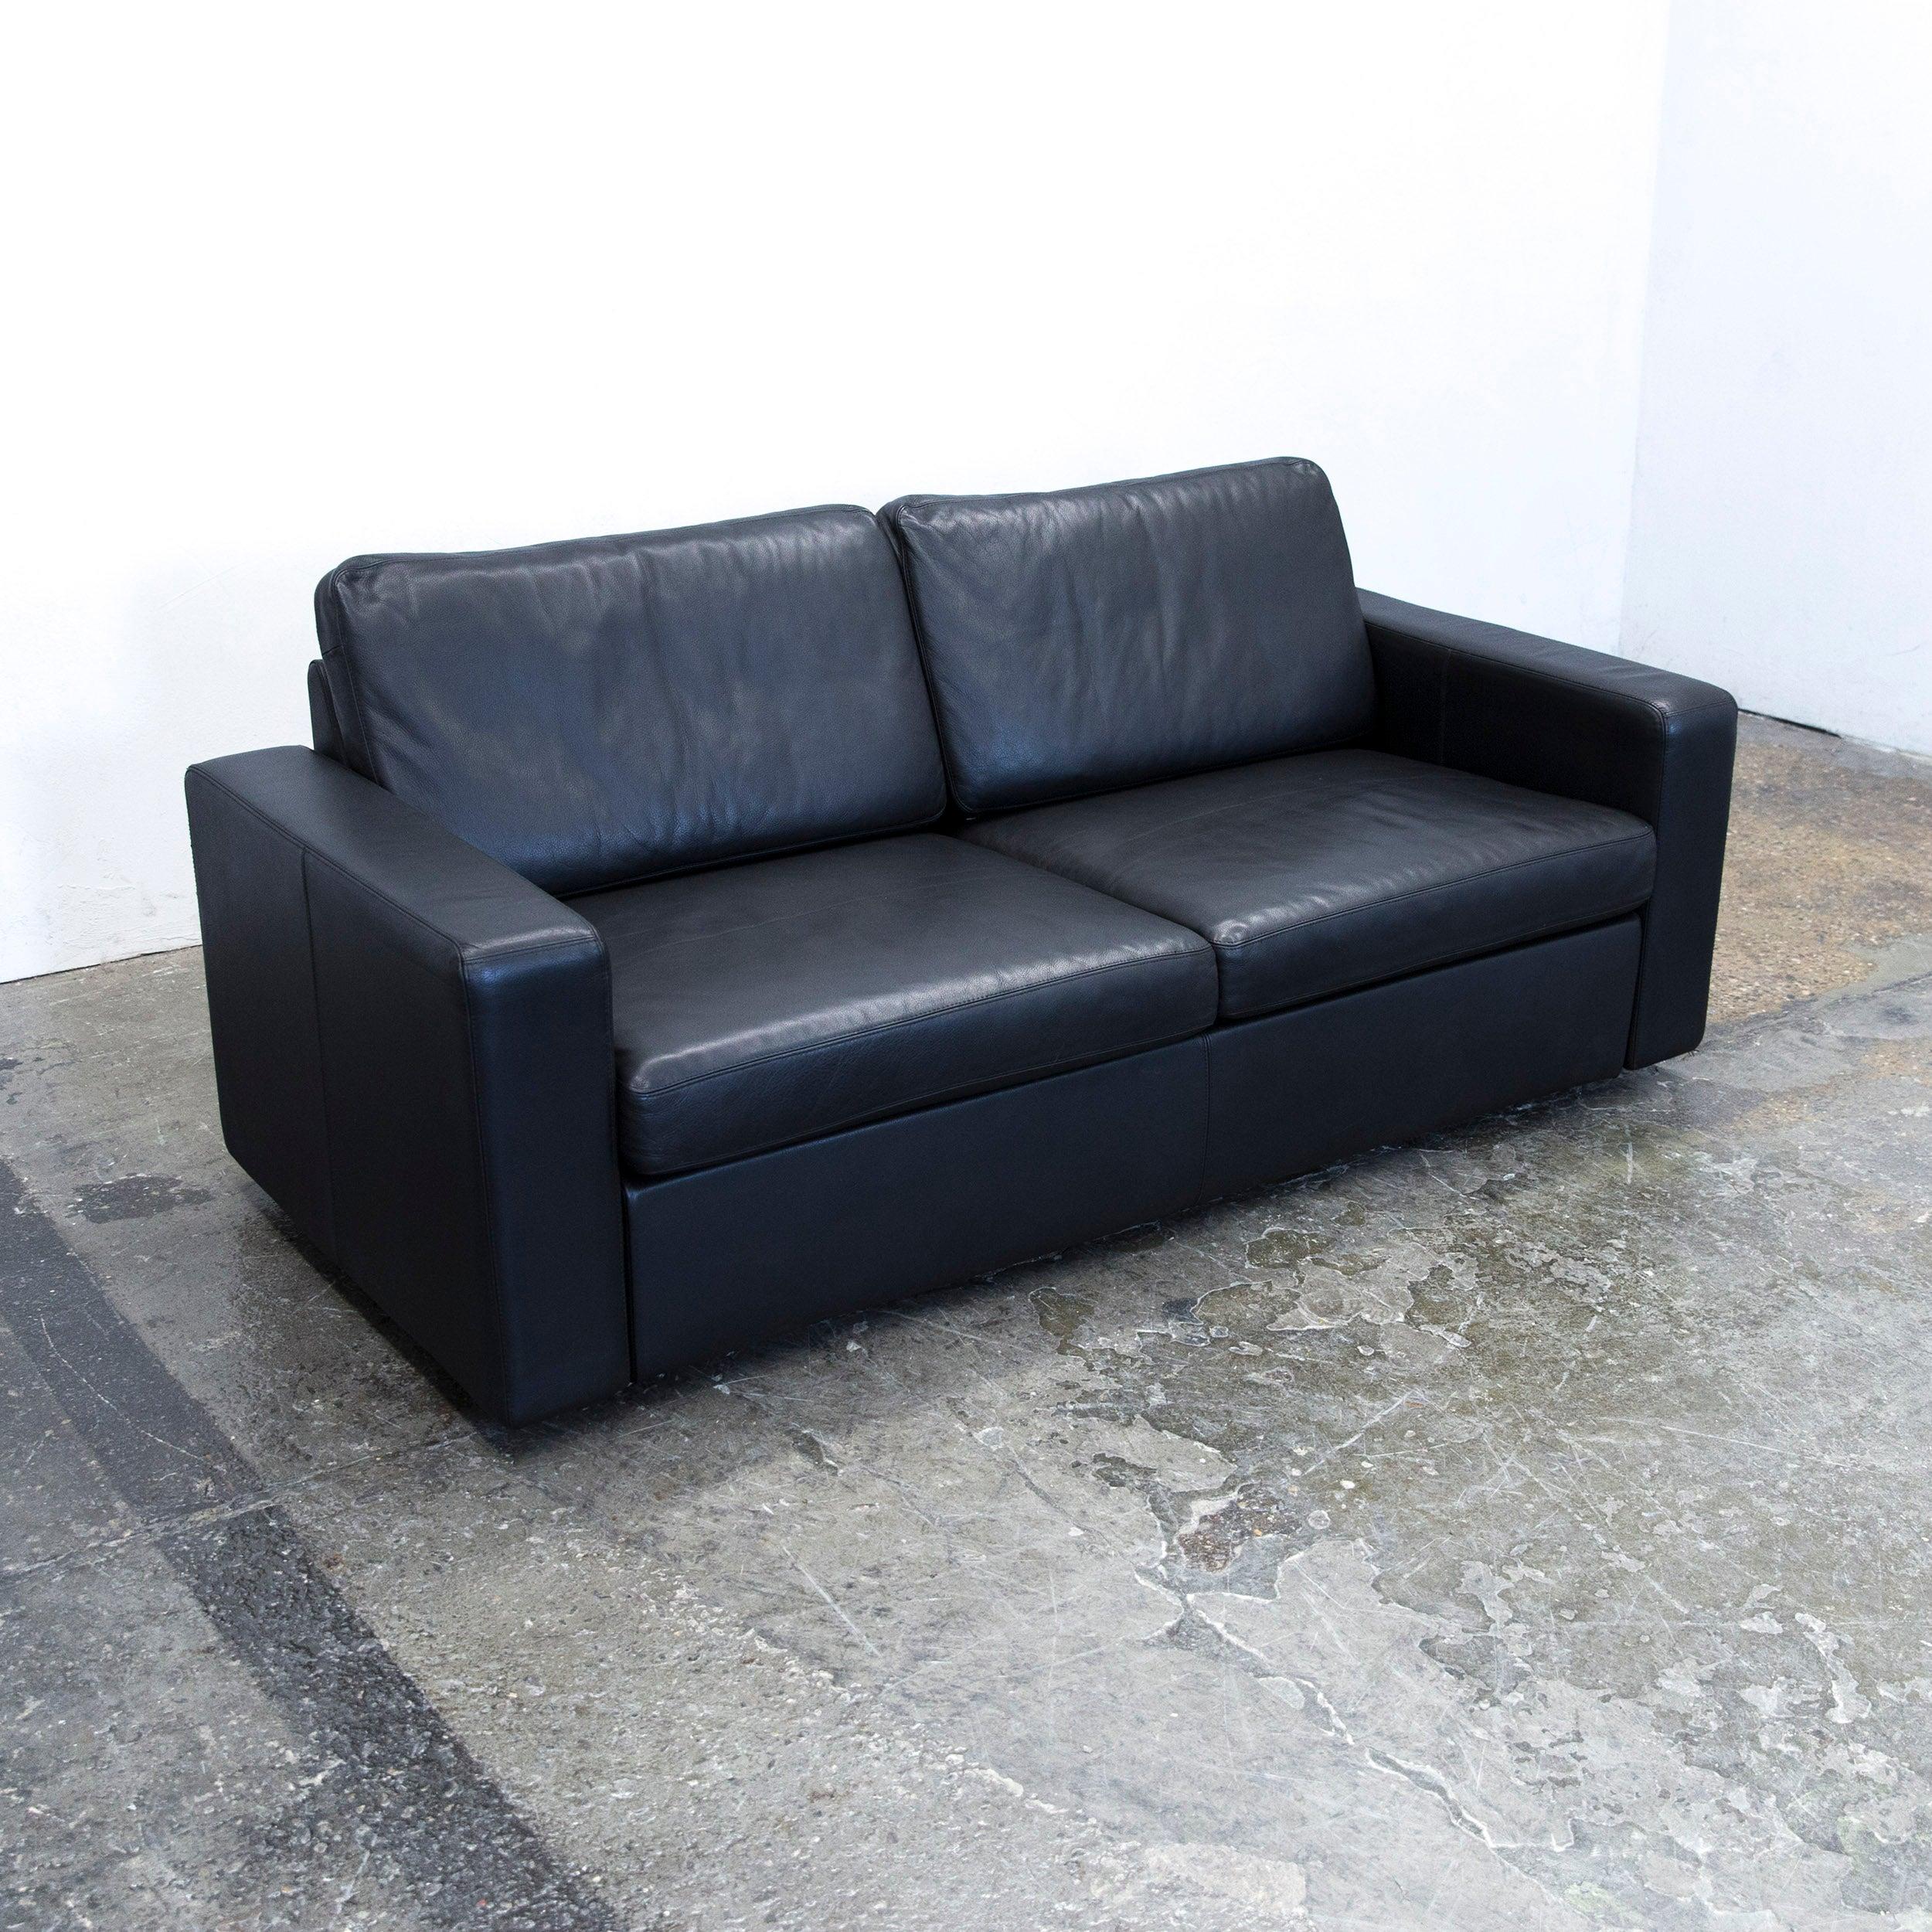 Cor Conseta Designer Sofa Leather Black Sleepsofa Three Seat Couch